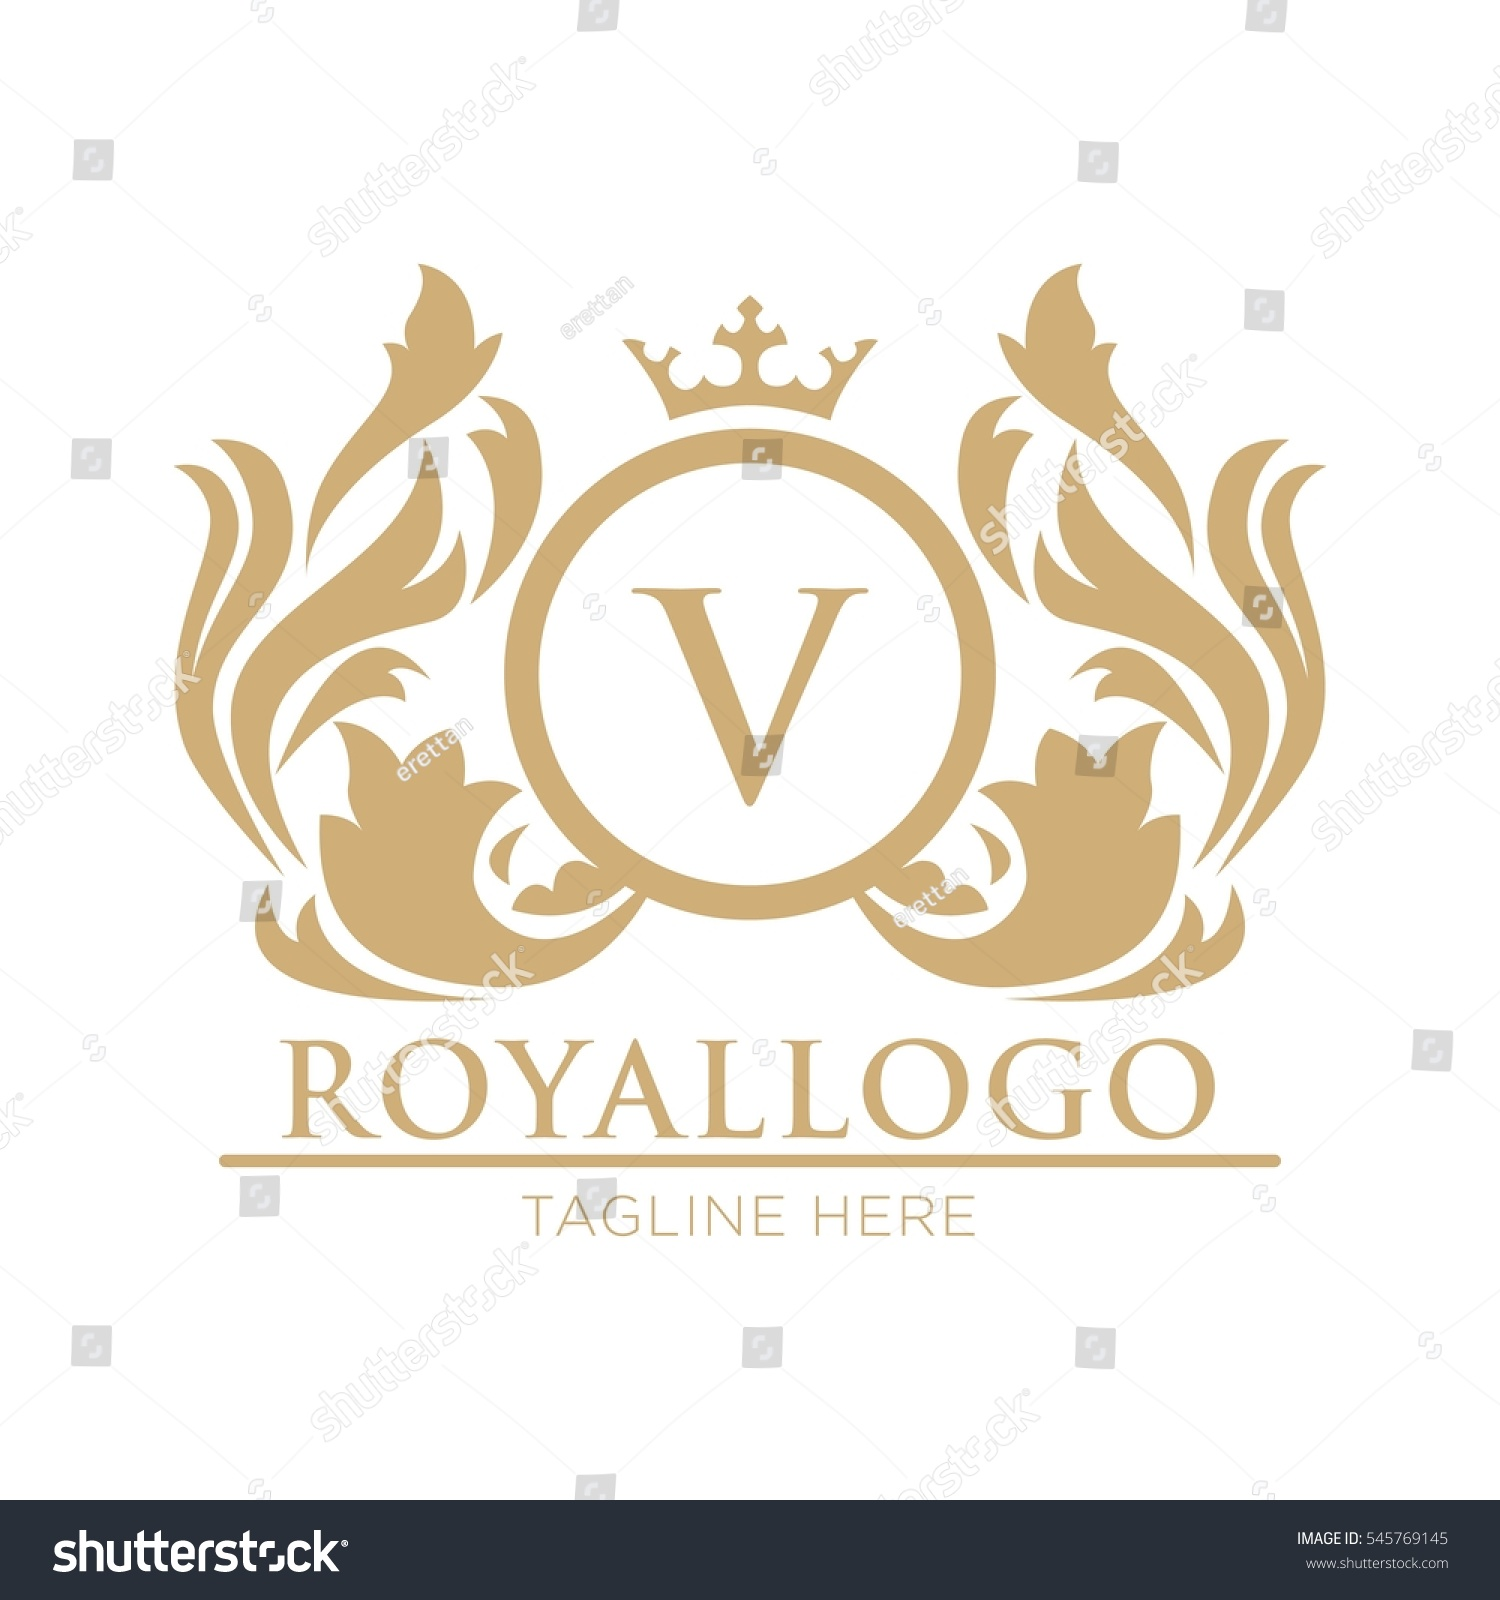 royal logo design template stock vector 545769145 shutterstock. Black Bedroom Furniture Sets. Home Design Ideas